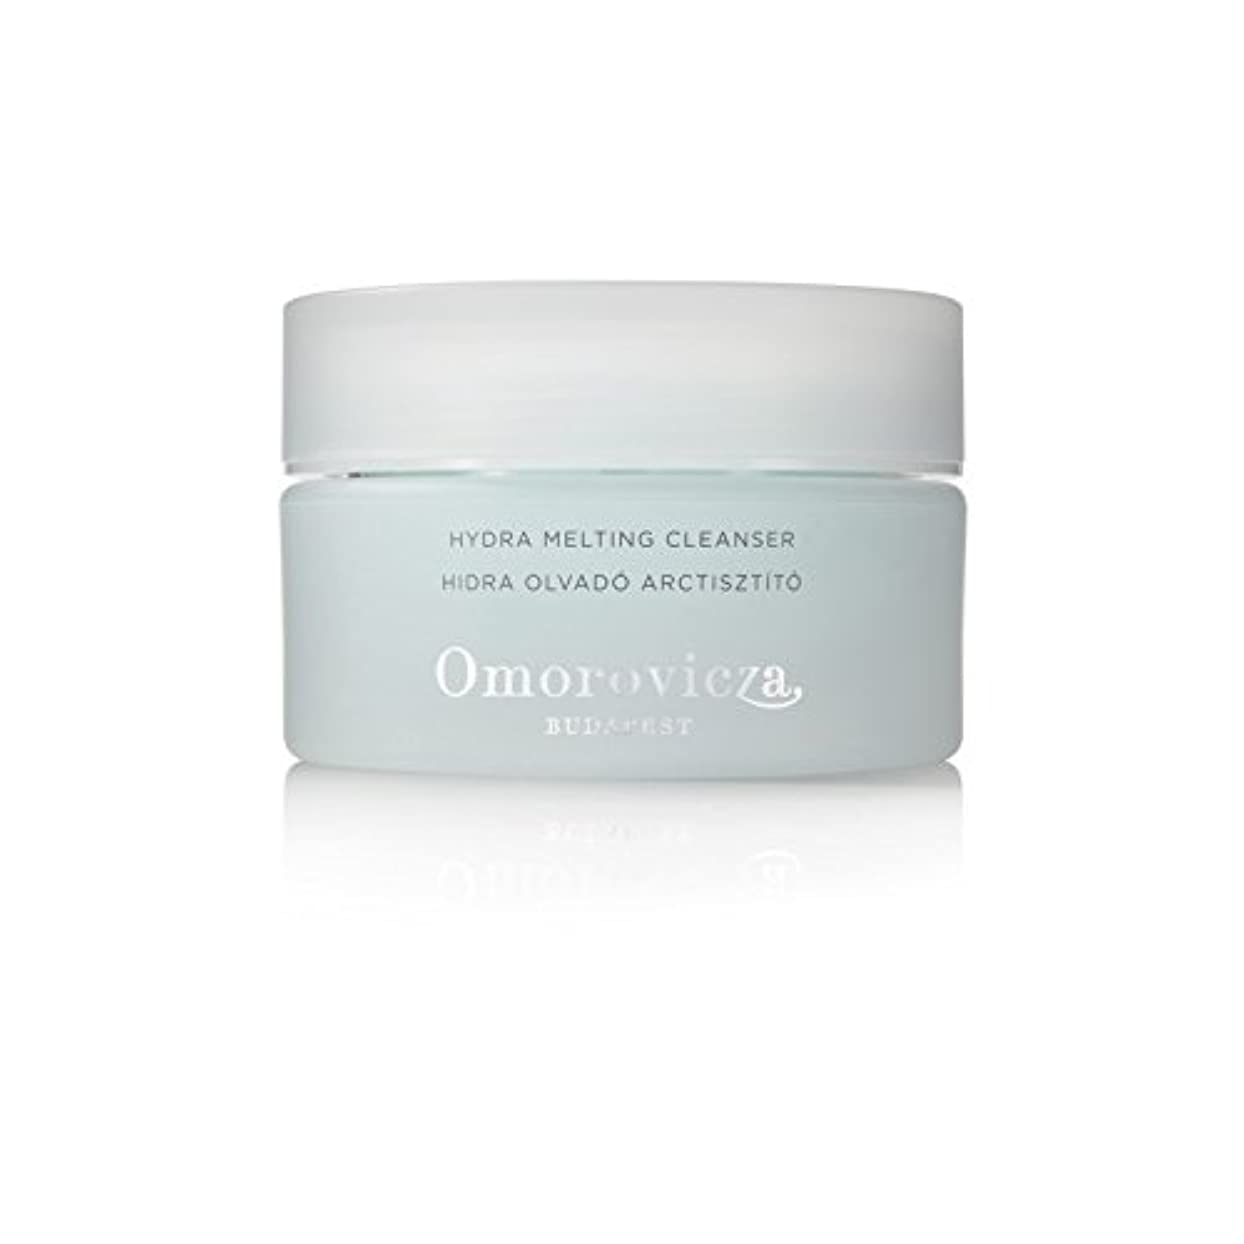 Omorovicza Hydra Melting Cleanser (100ml) (Pack of 6) - ヒドラ溶融クレンザー(100)に x6 [並行輸入品]